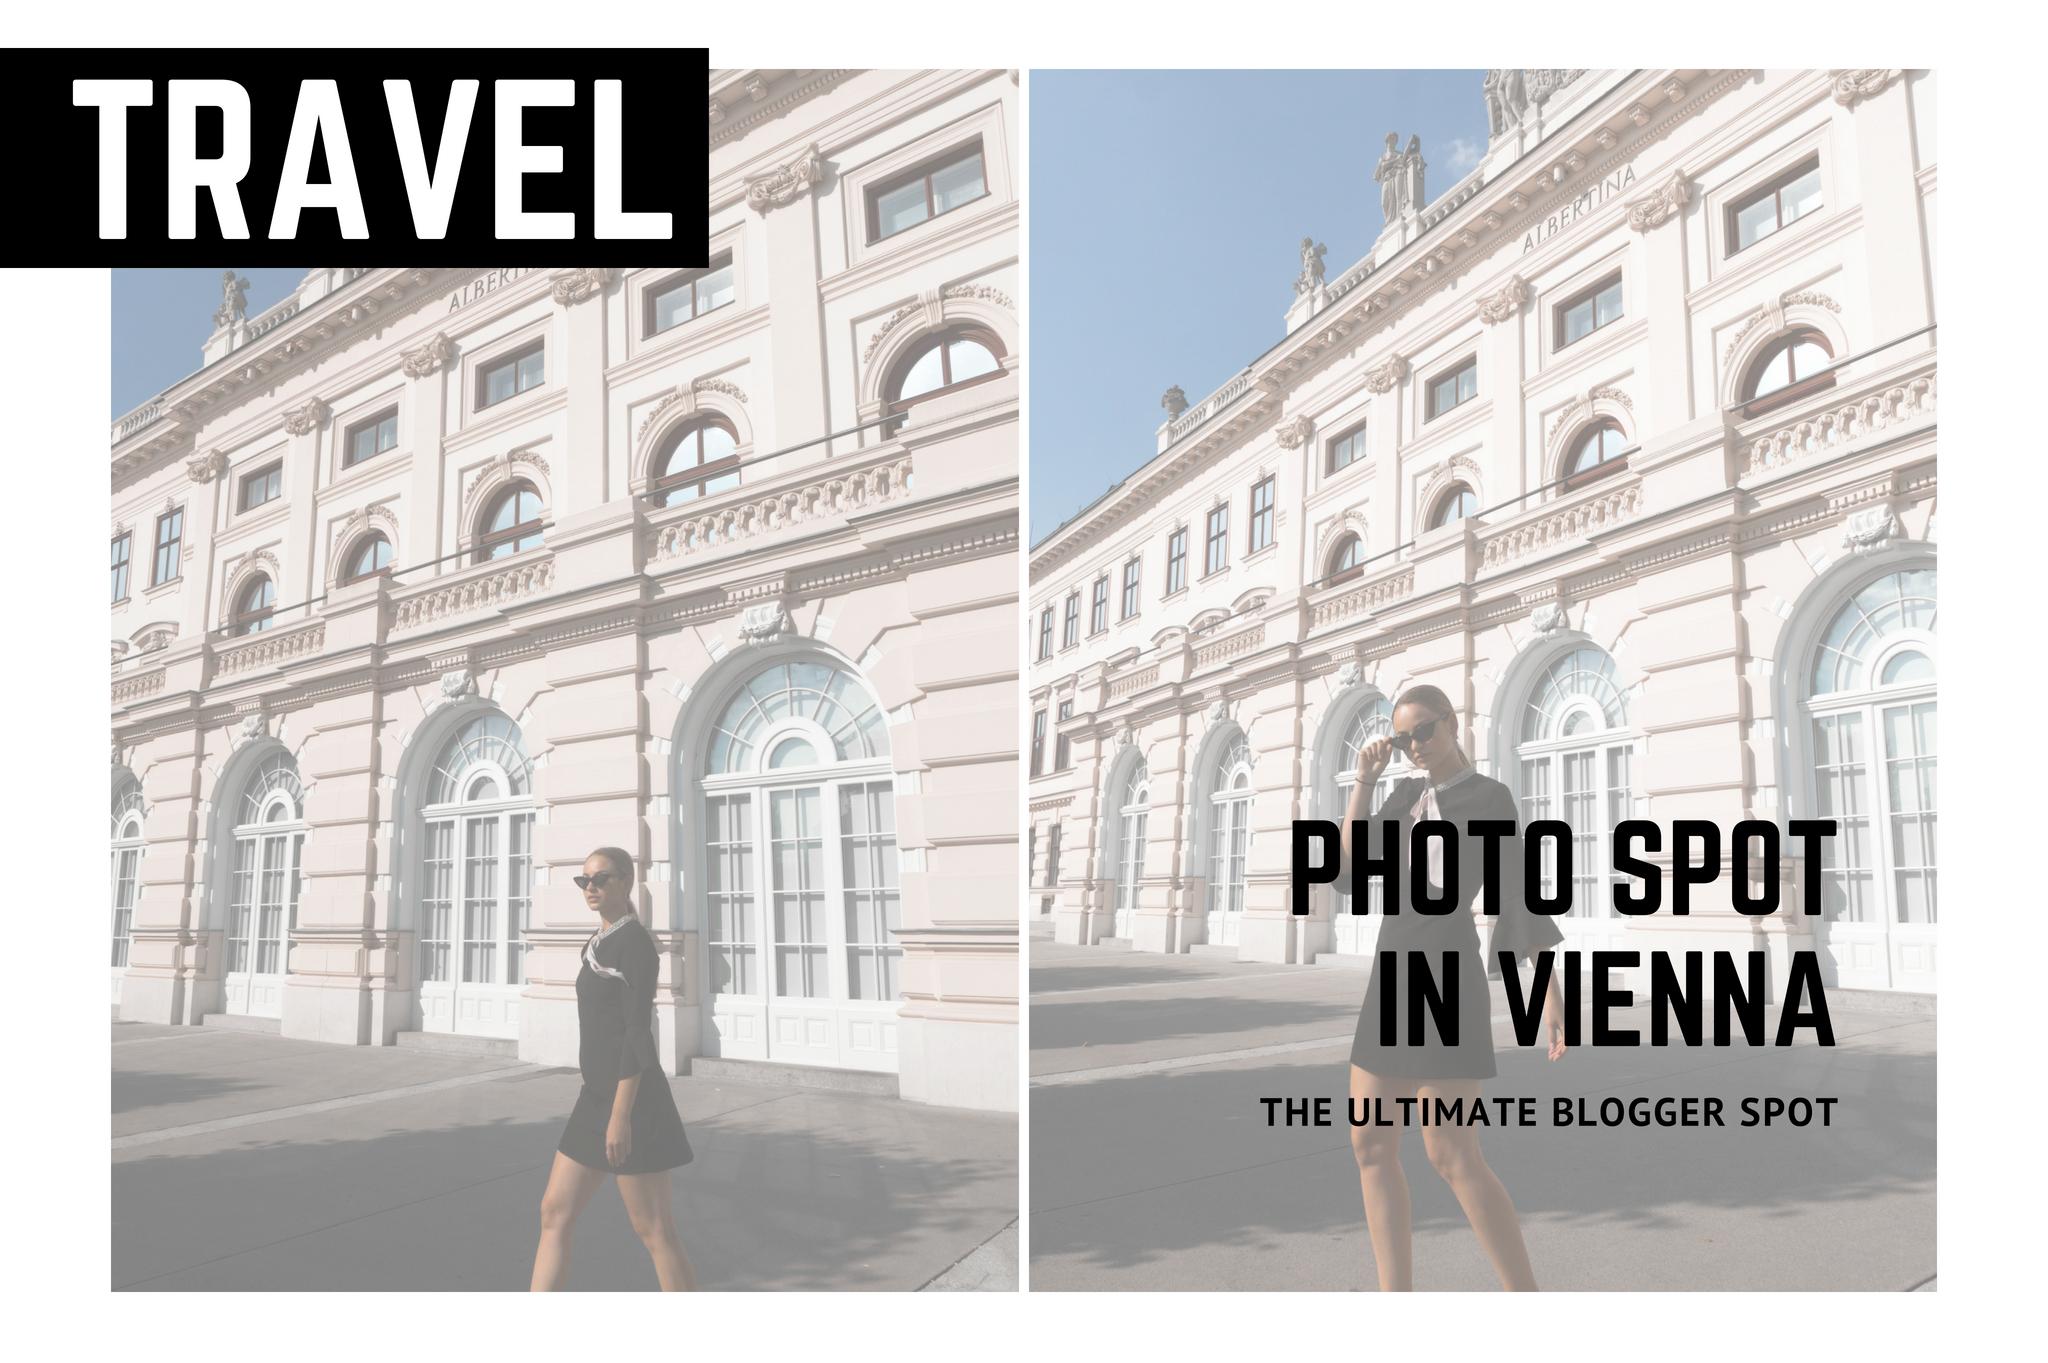 blogger photo spot in vienna albertina fashion blogger instagrammable place in vienna